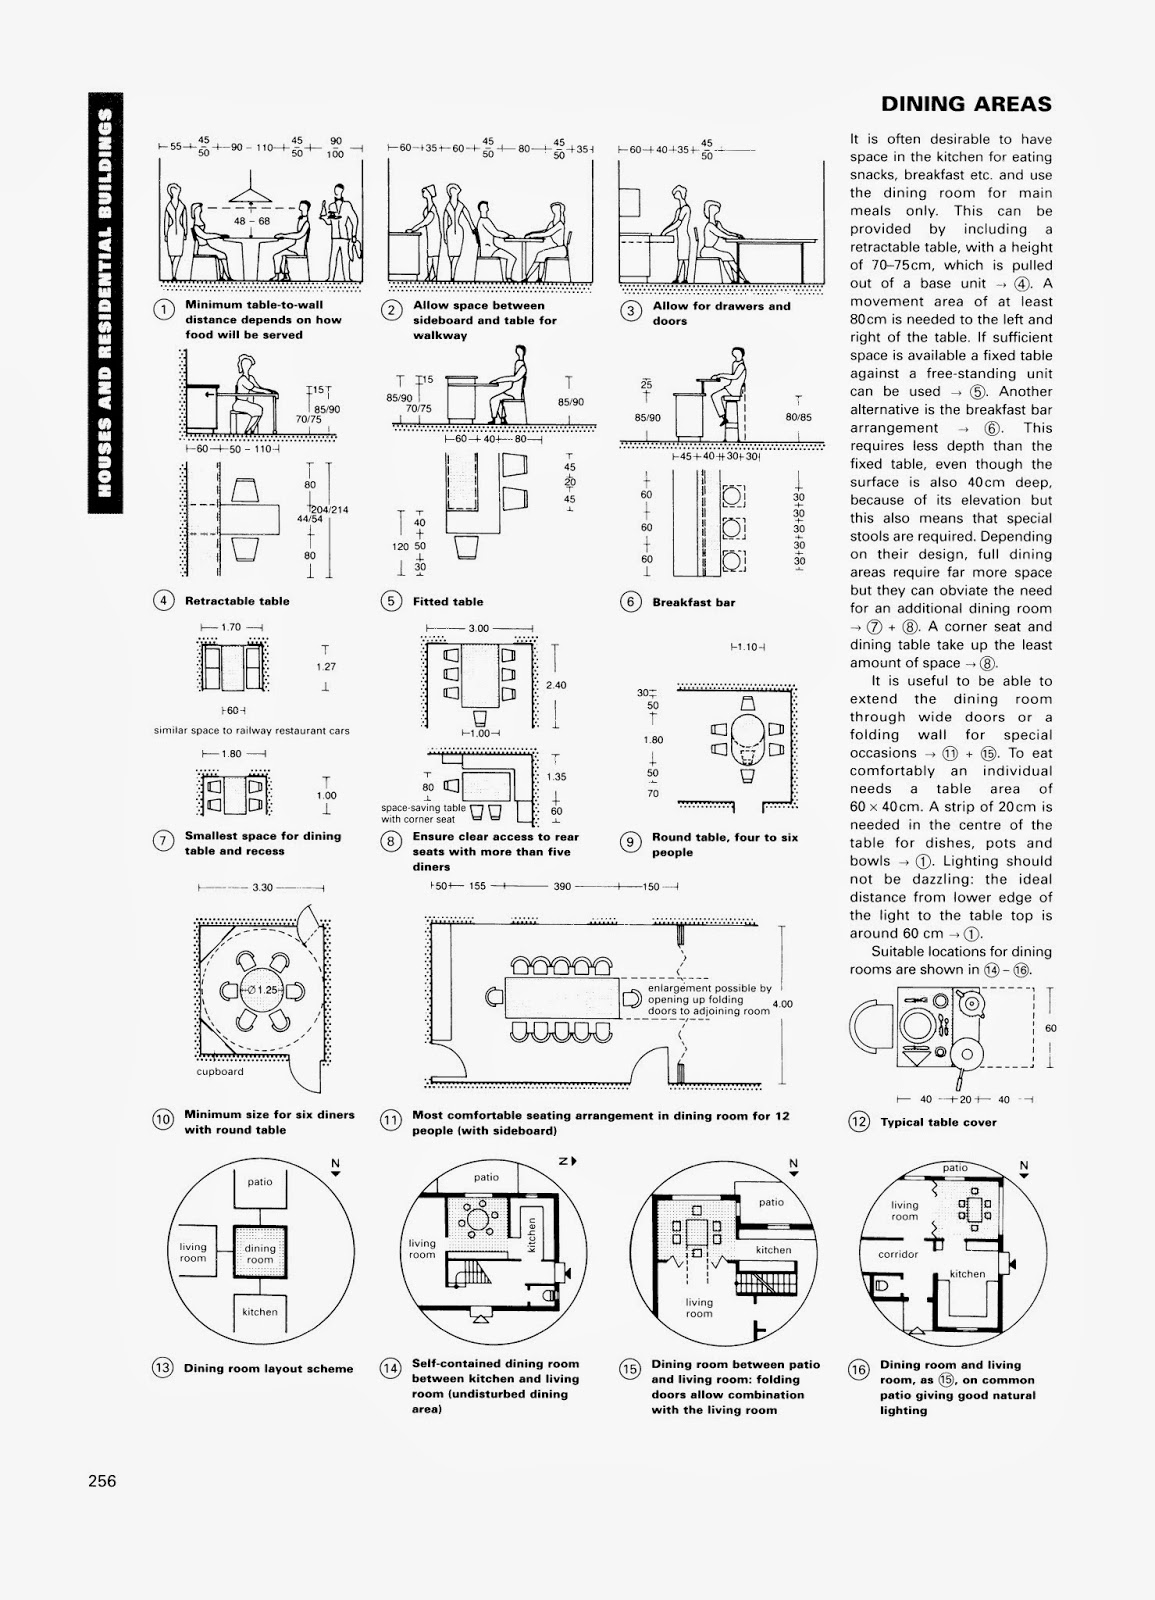 labeled diagram of stairs diagram of door stairs arpl2000